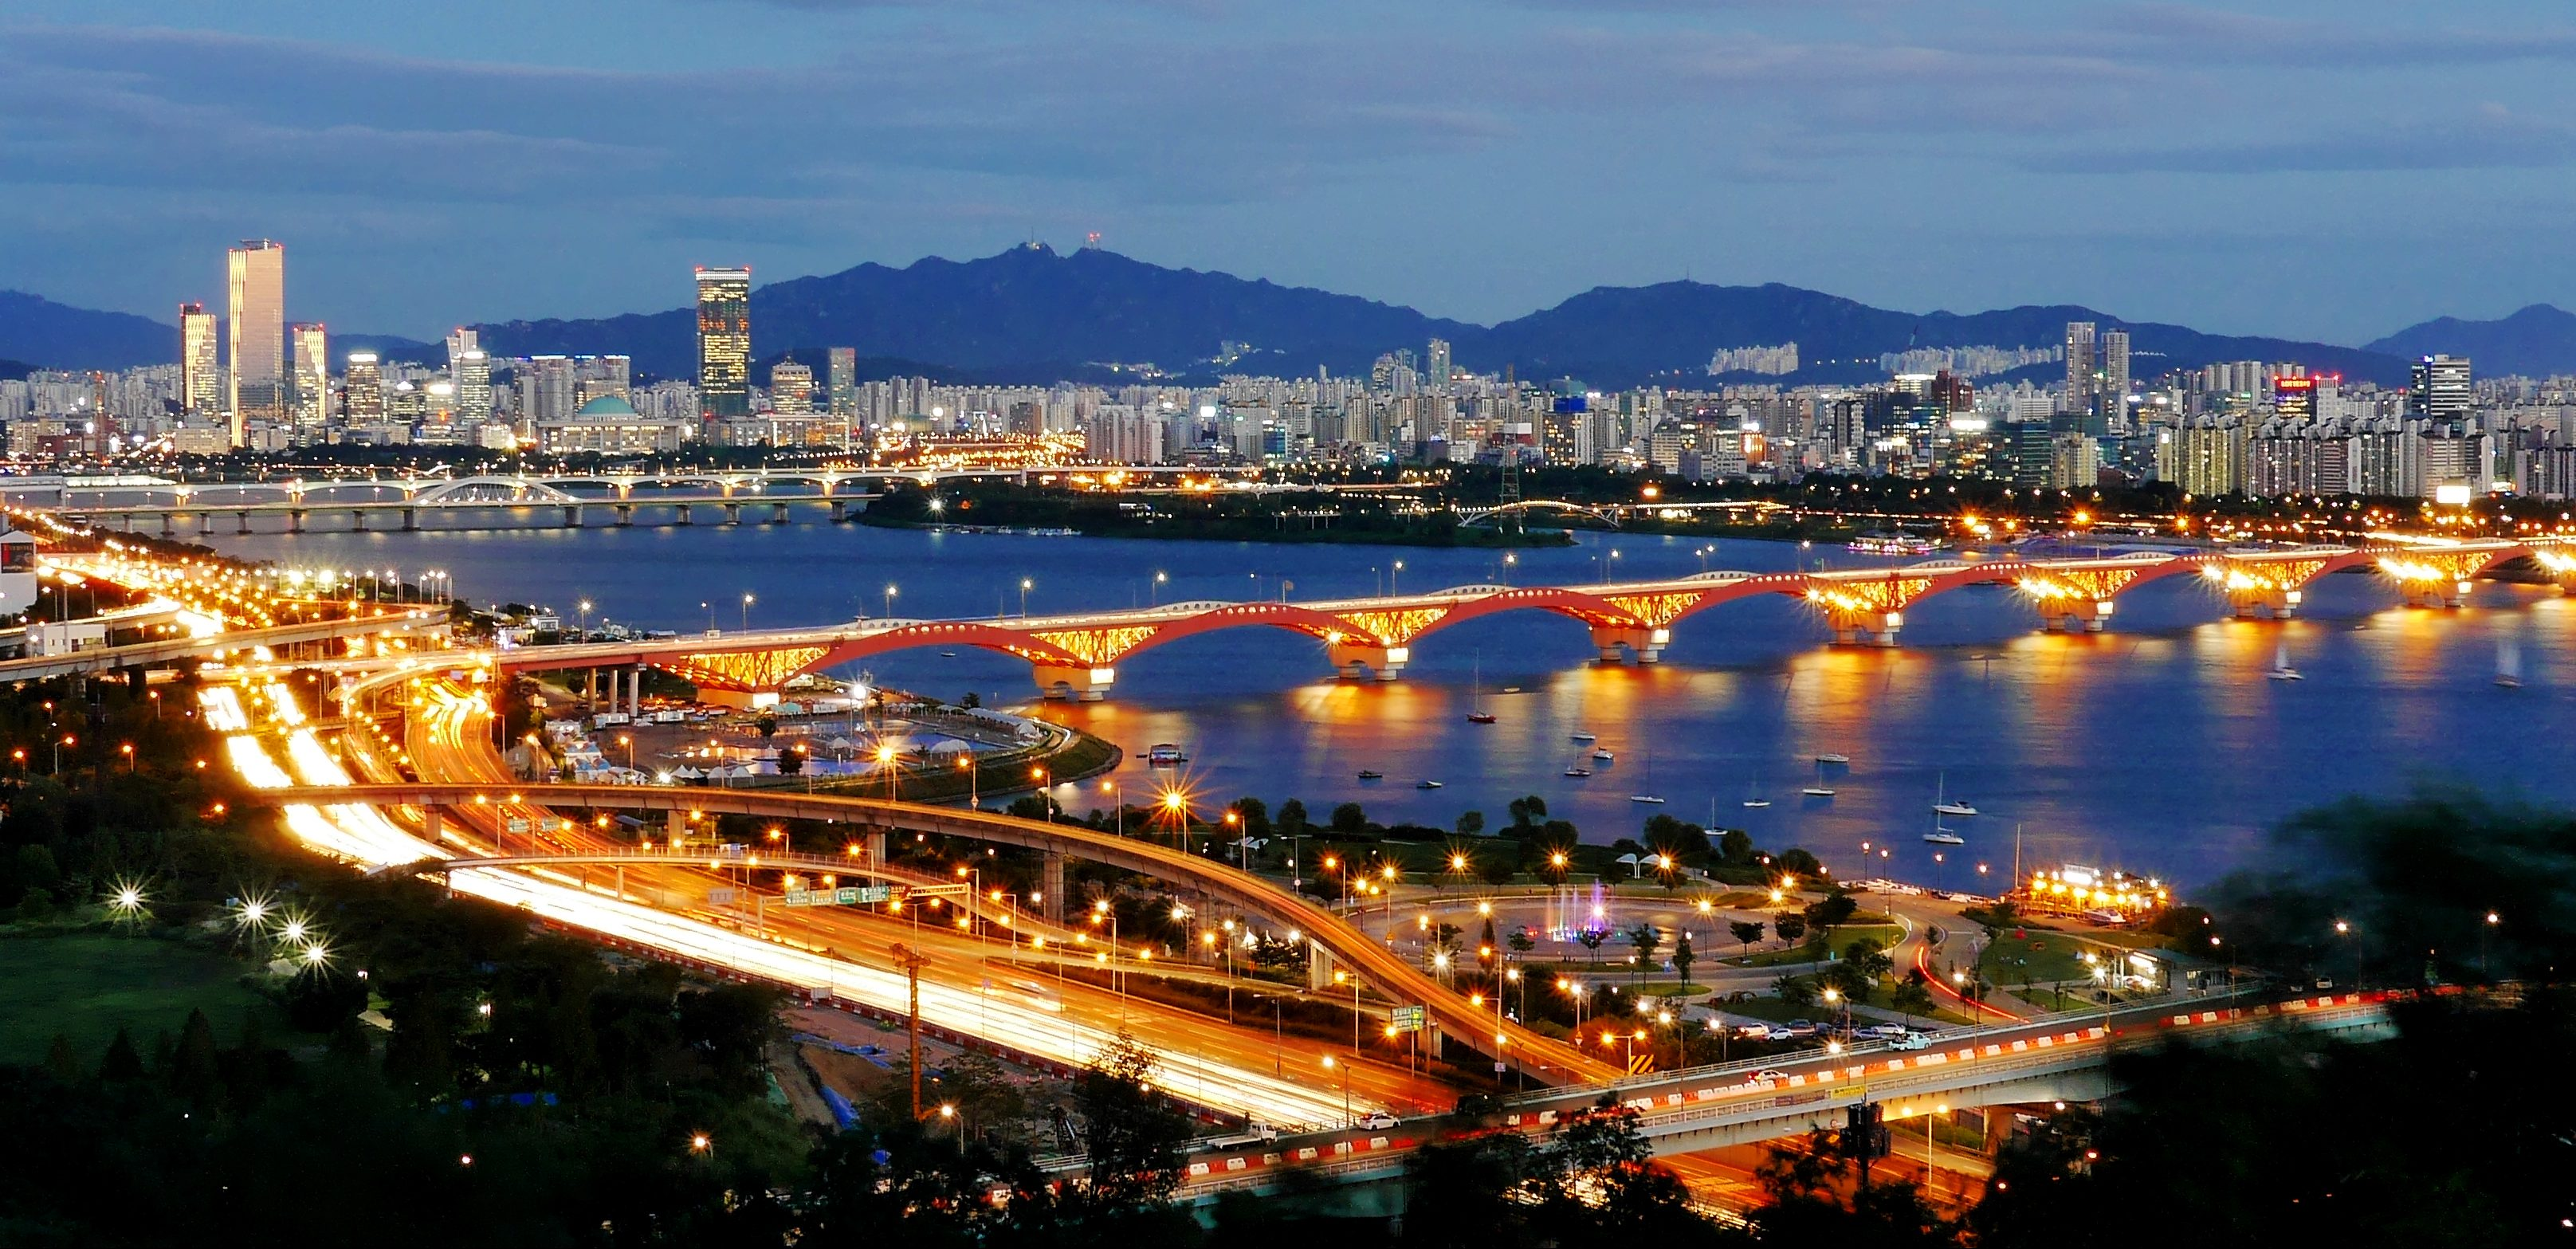 Seoul, Seongsu-Brücke und Han-Fluss